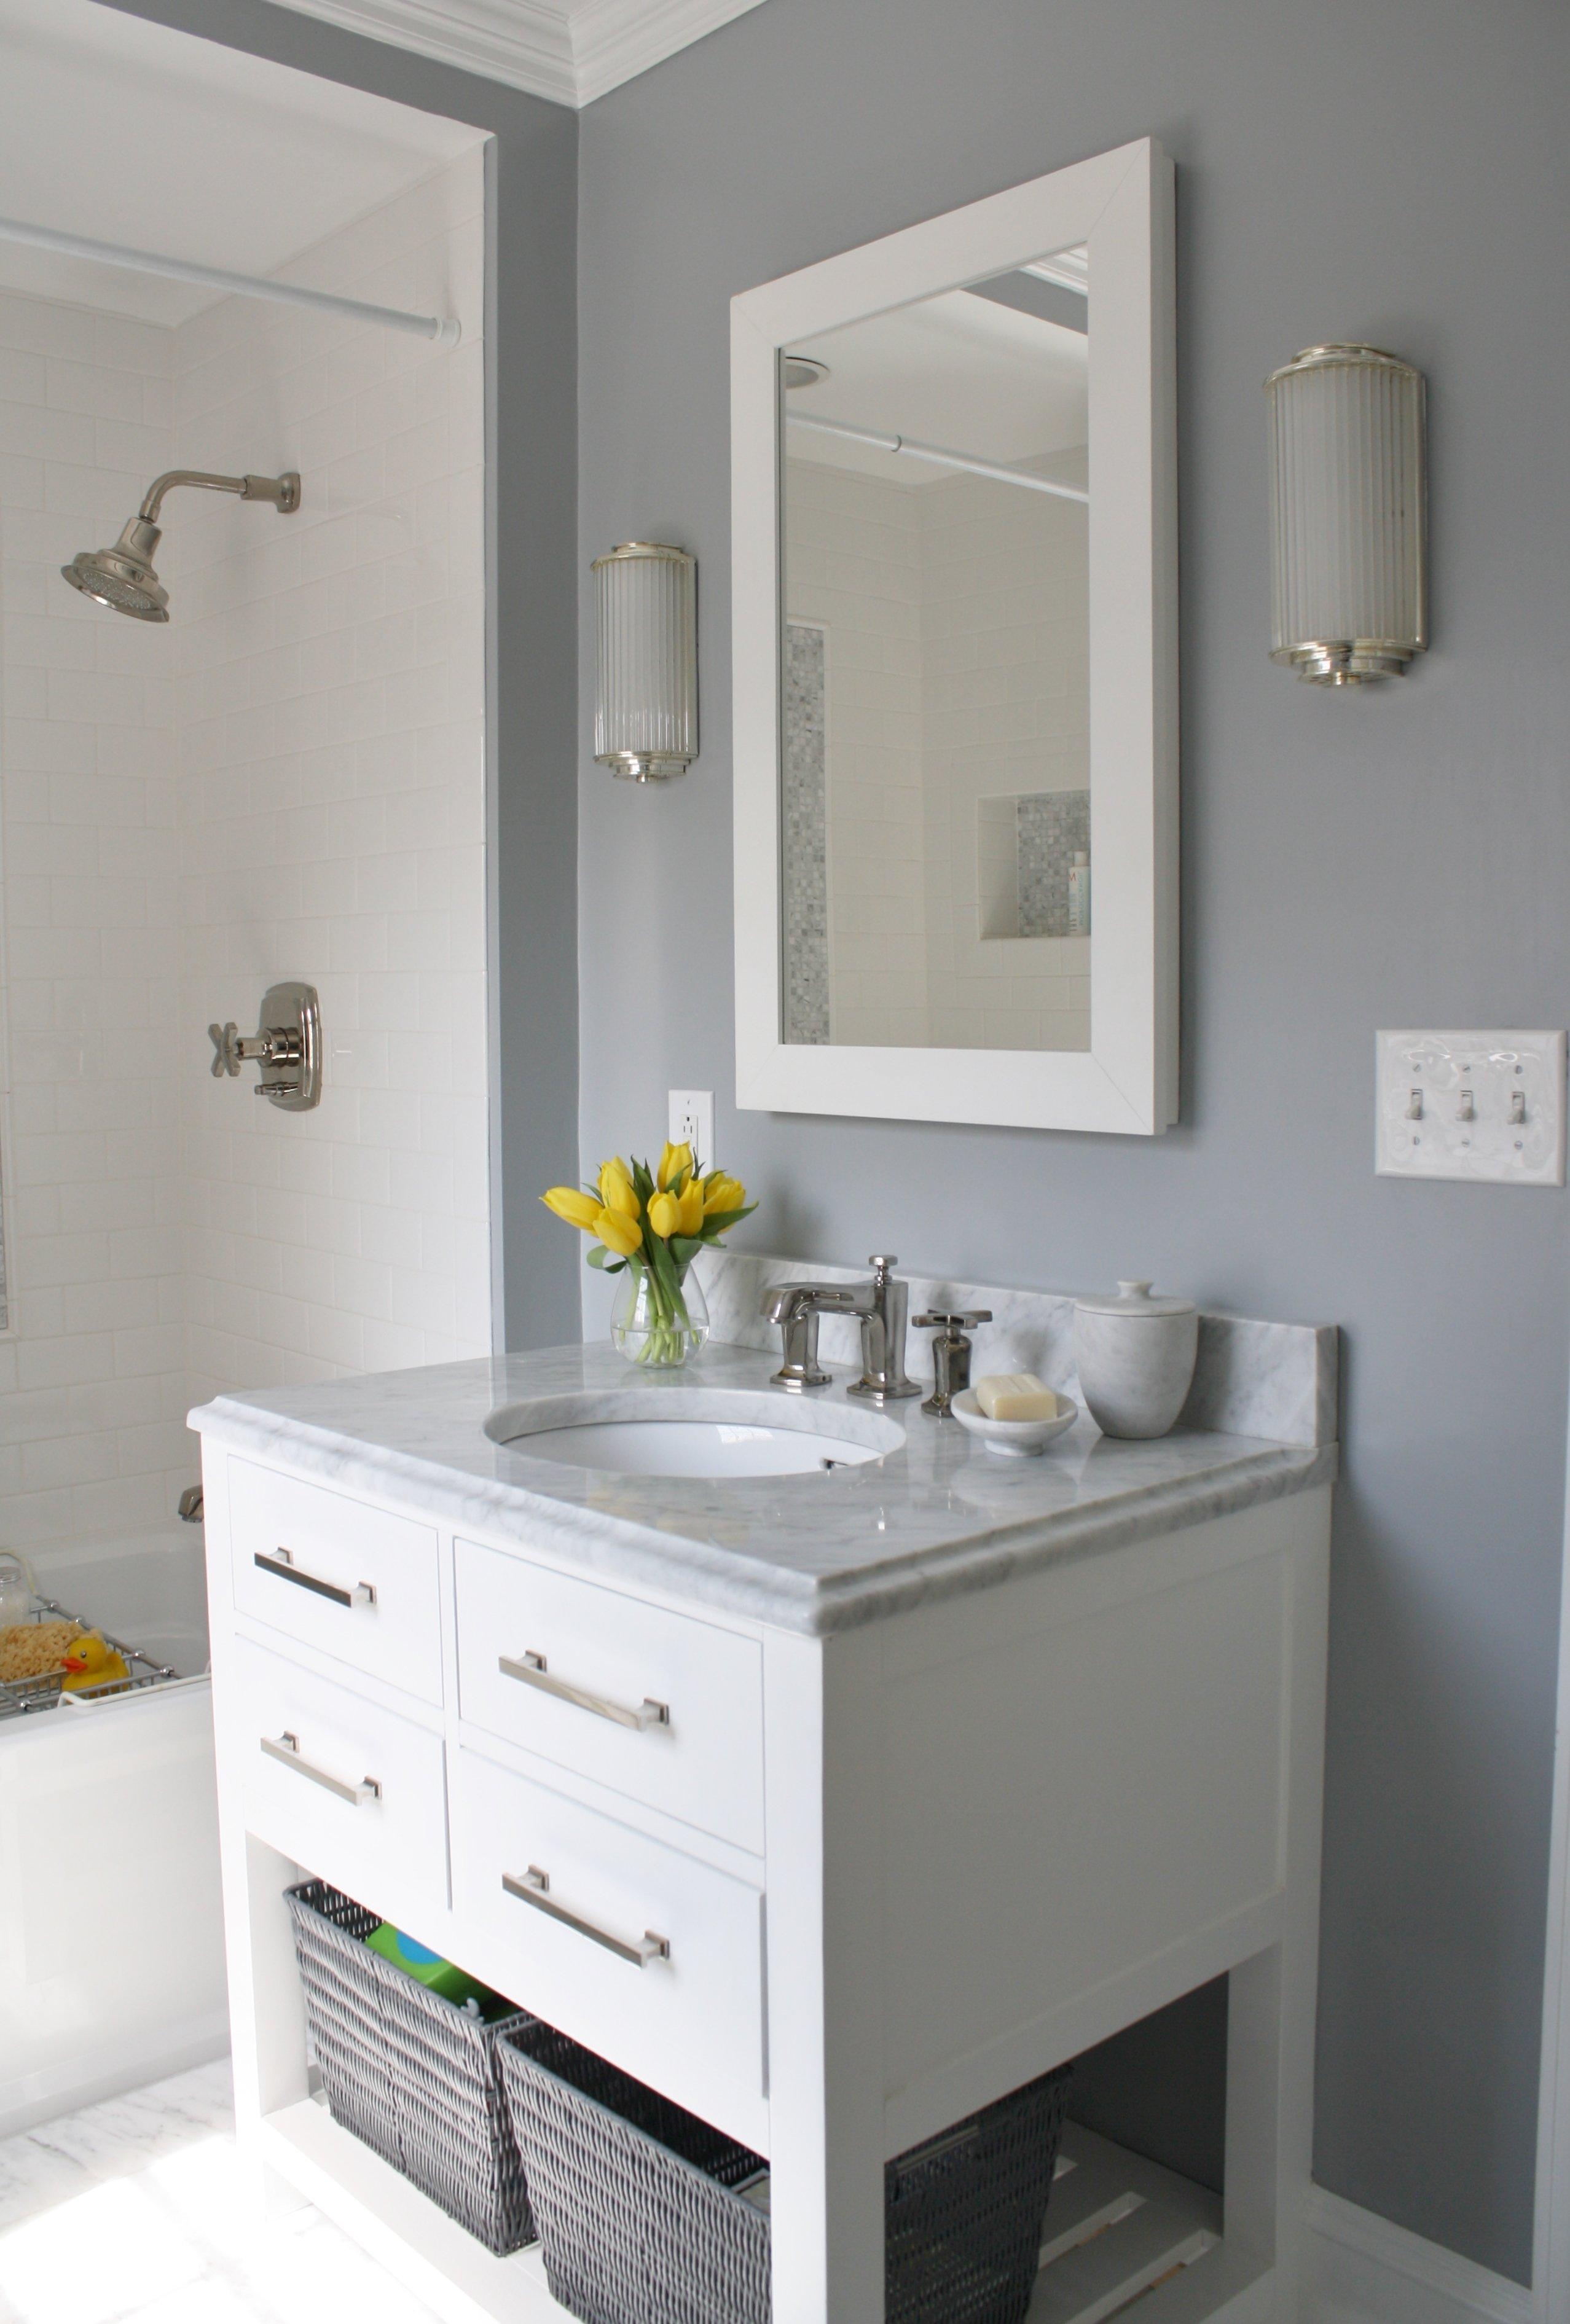 10 Famous Bathroom Color Ideas For Small Bathrooms small bathroom ideas fancy with shower idolza 2020